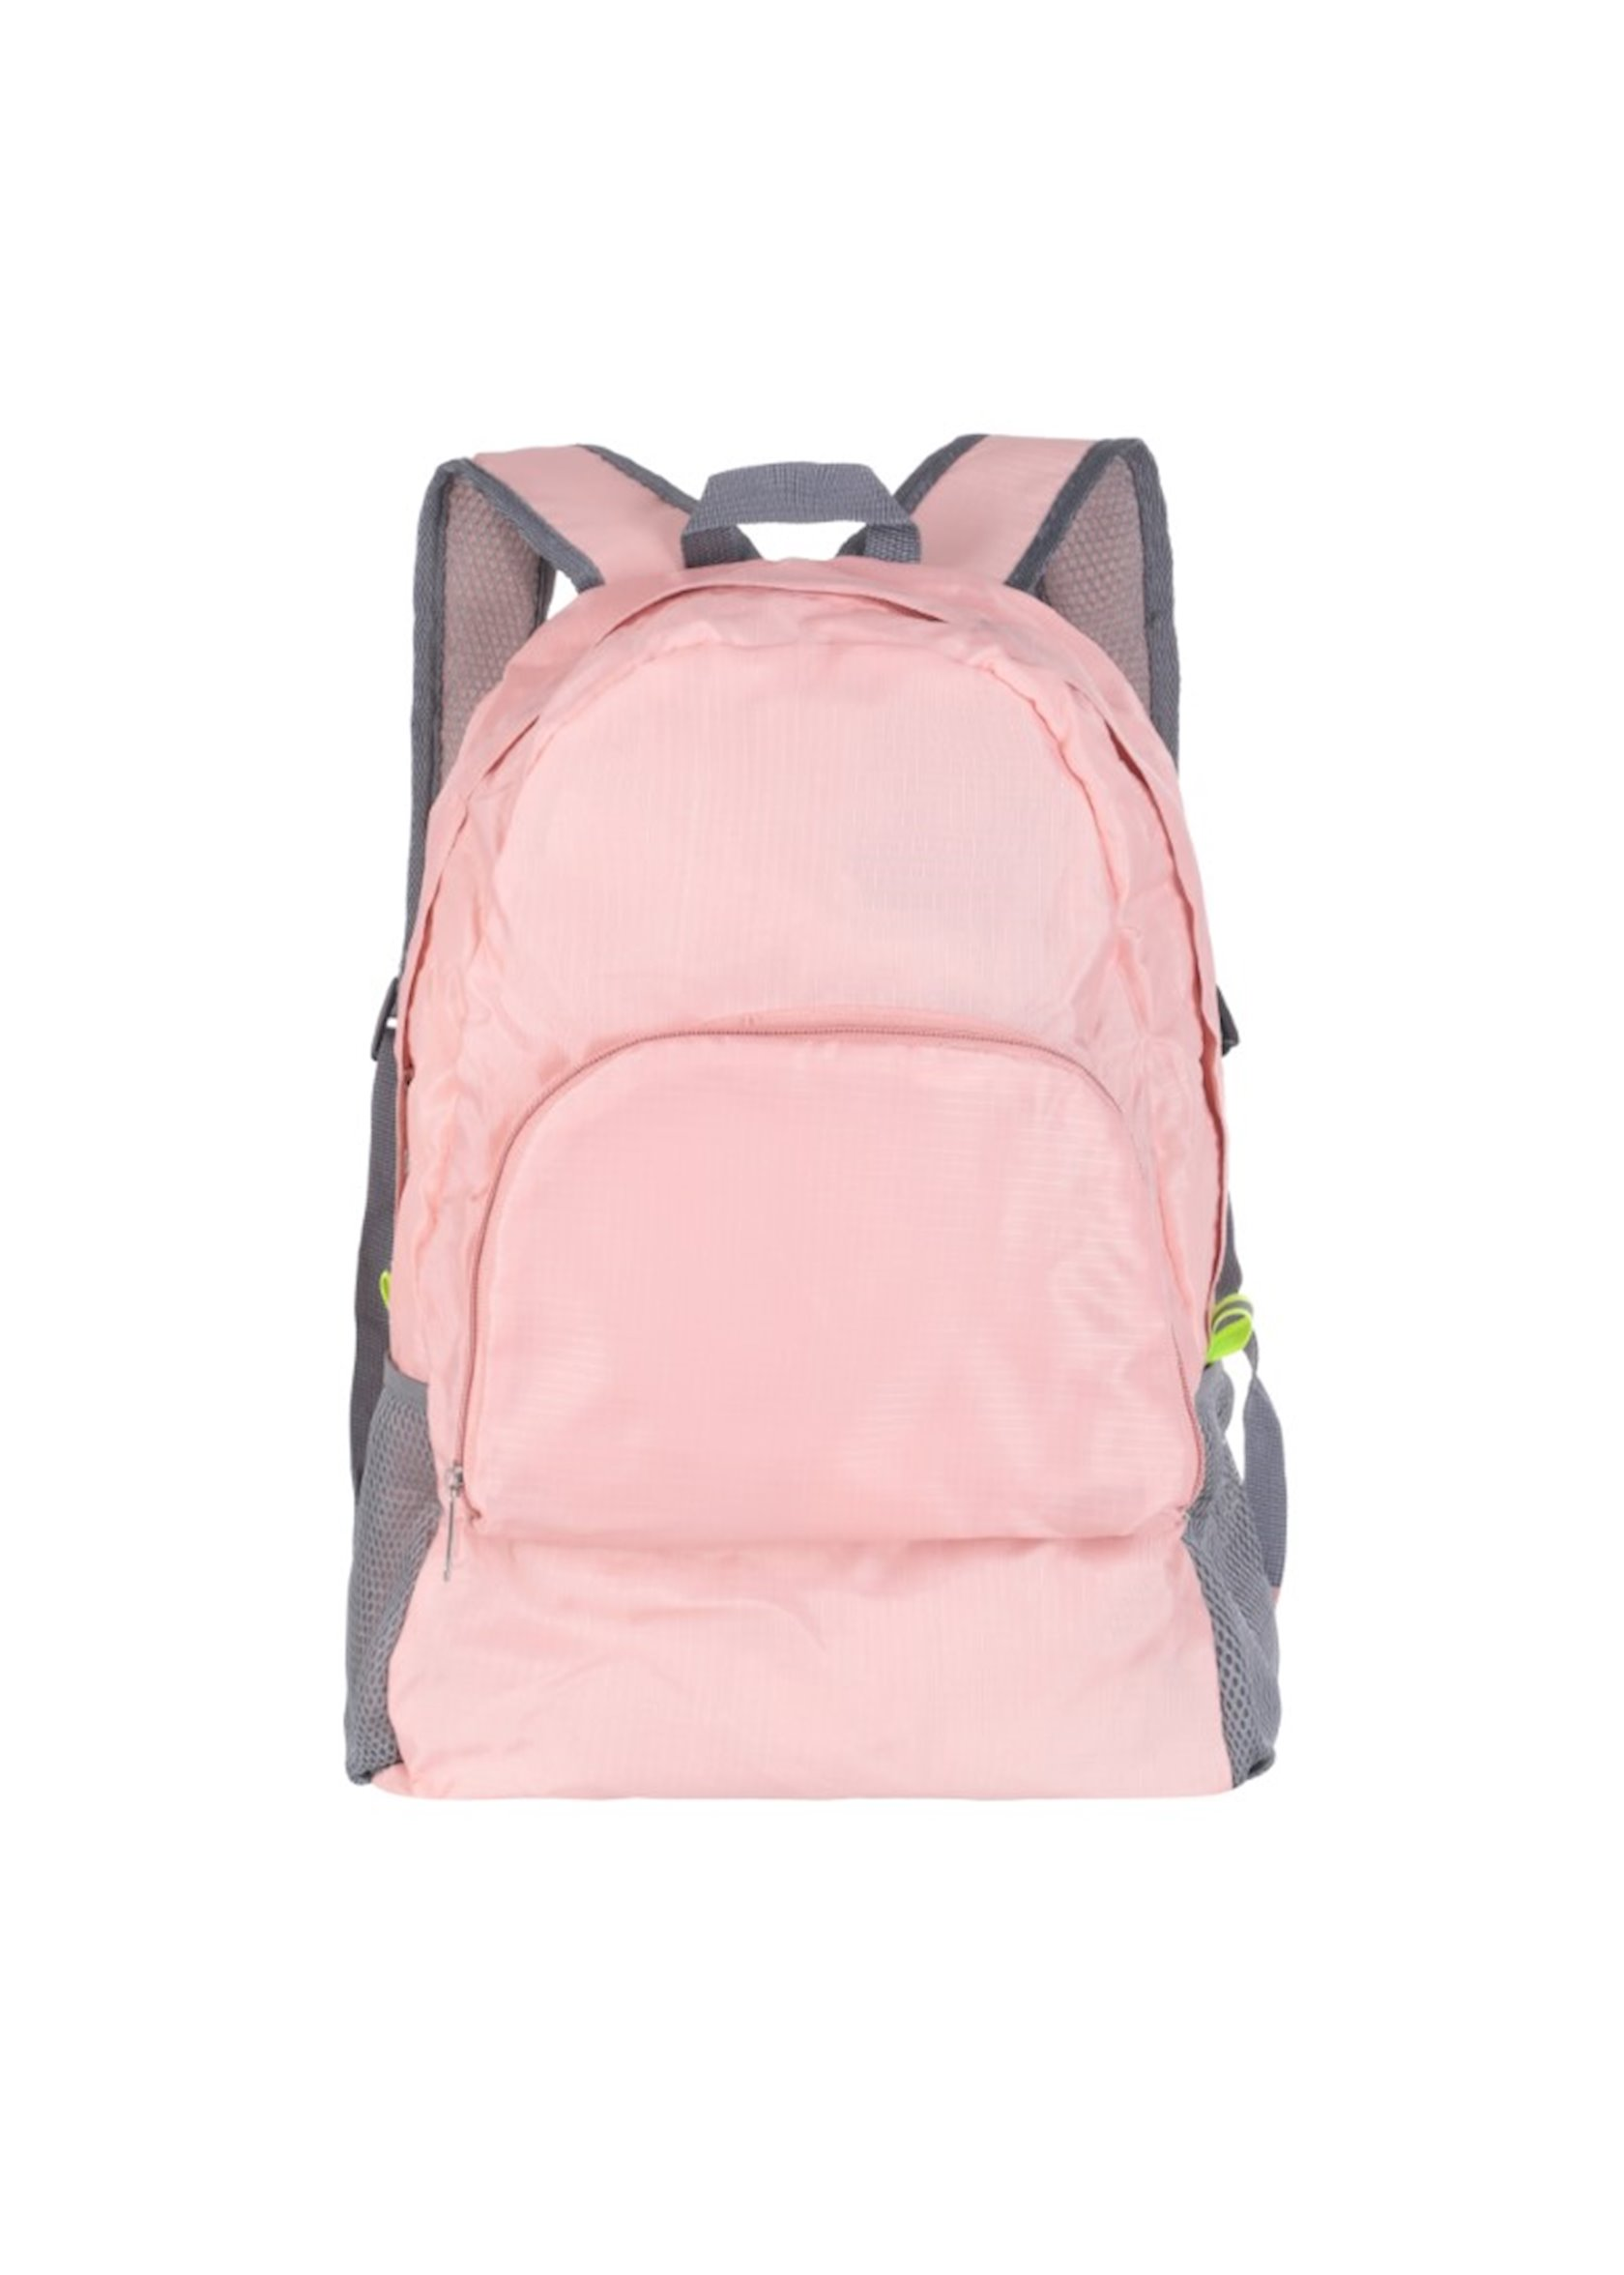 Qatlanan yol bel çantası Miniso Foldable Travel Backpack (Pink)